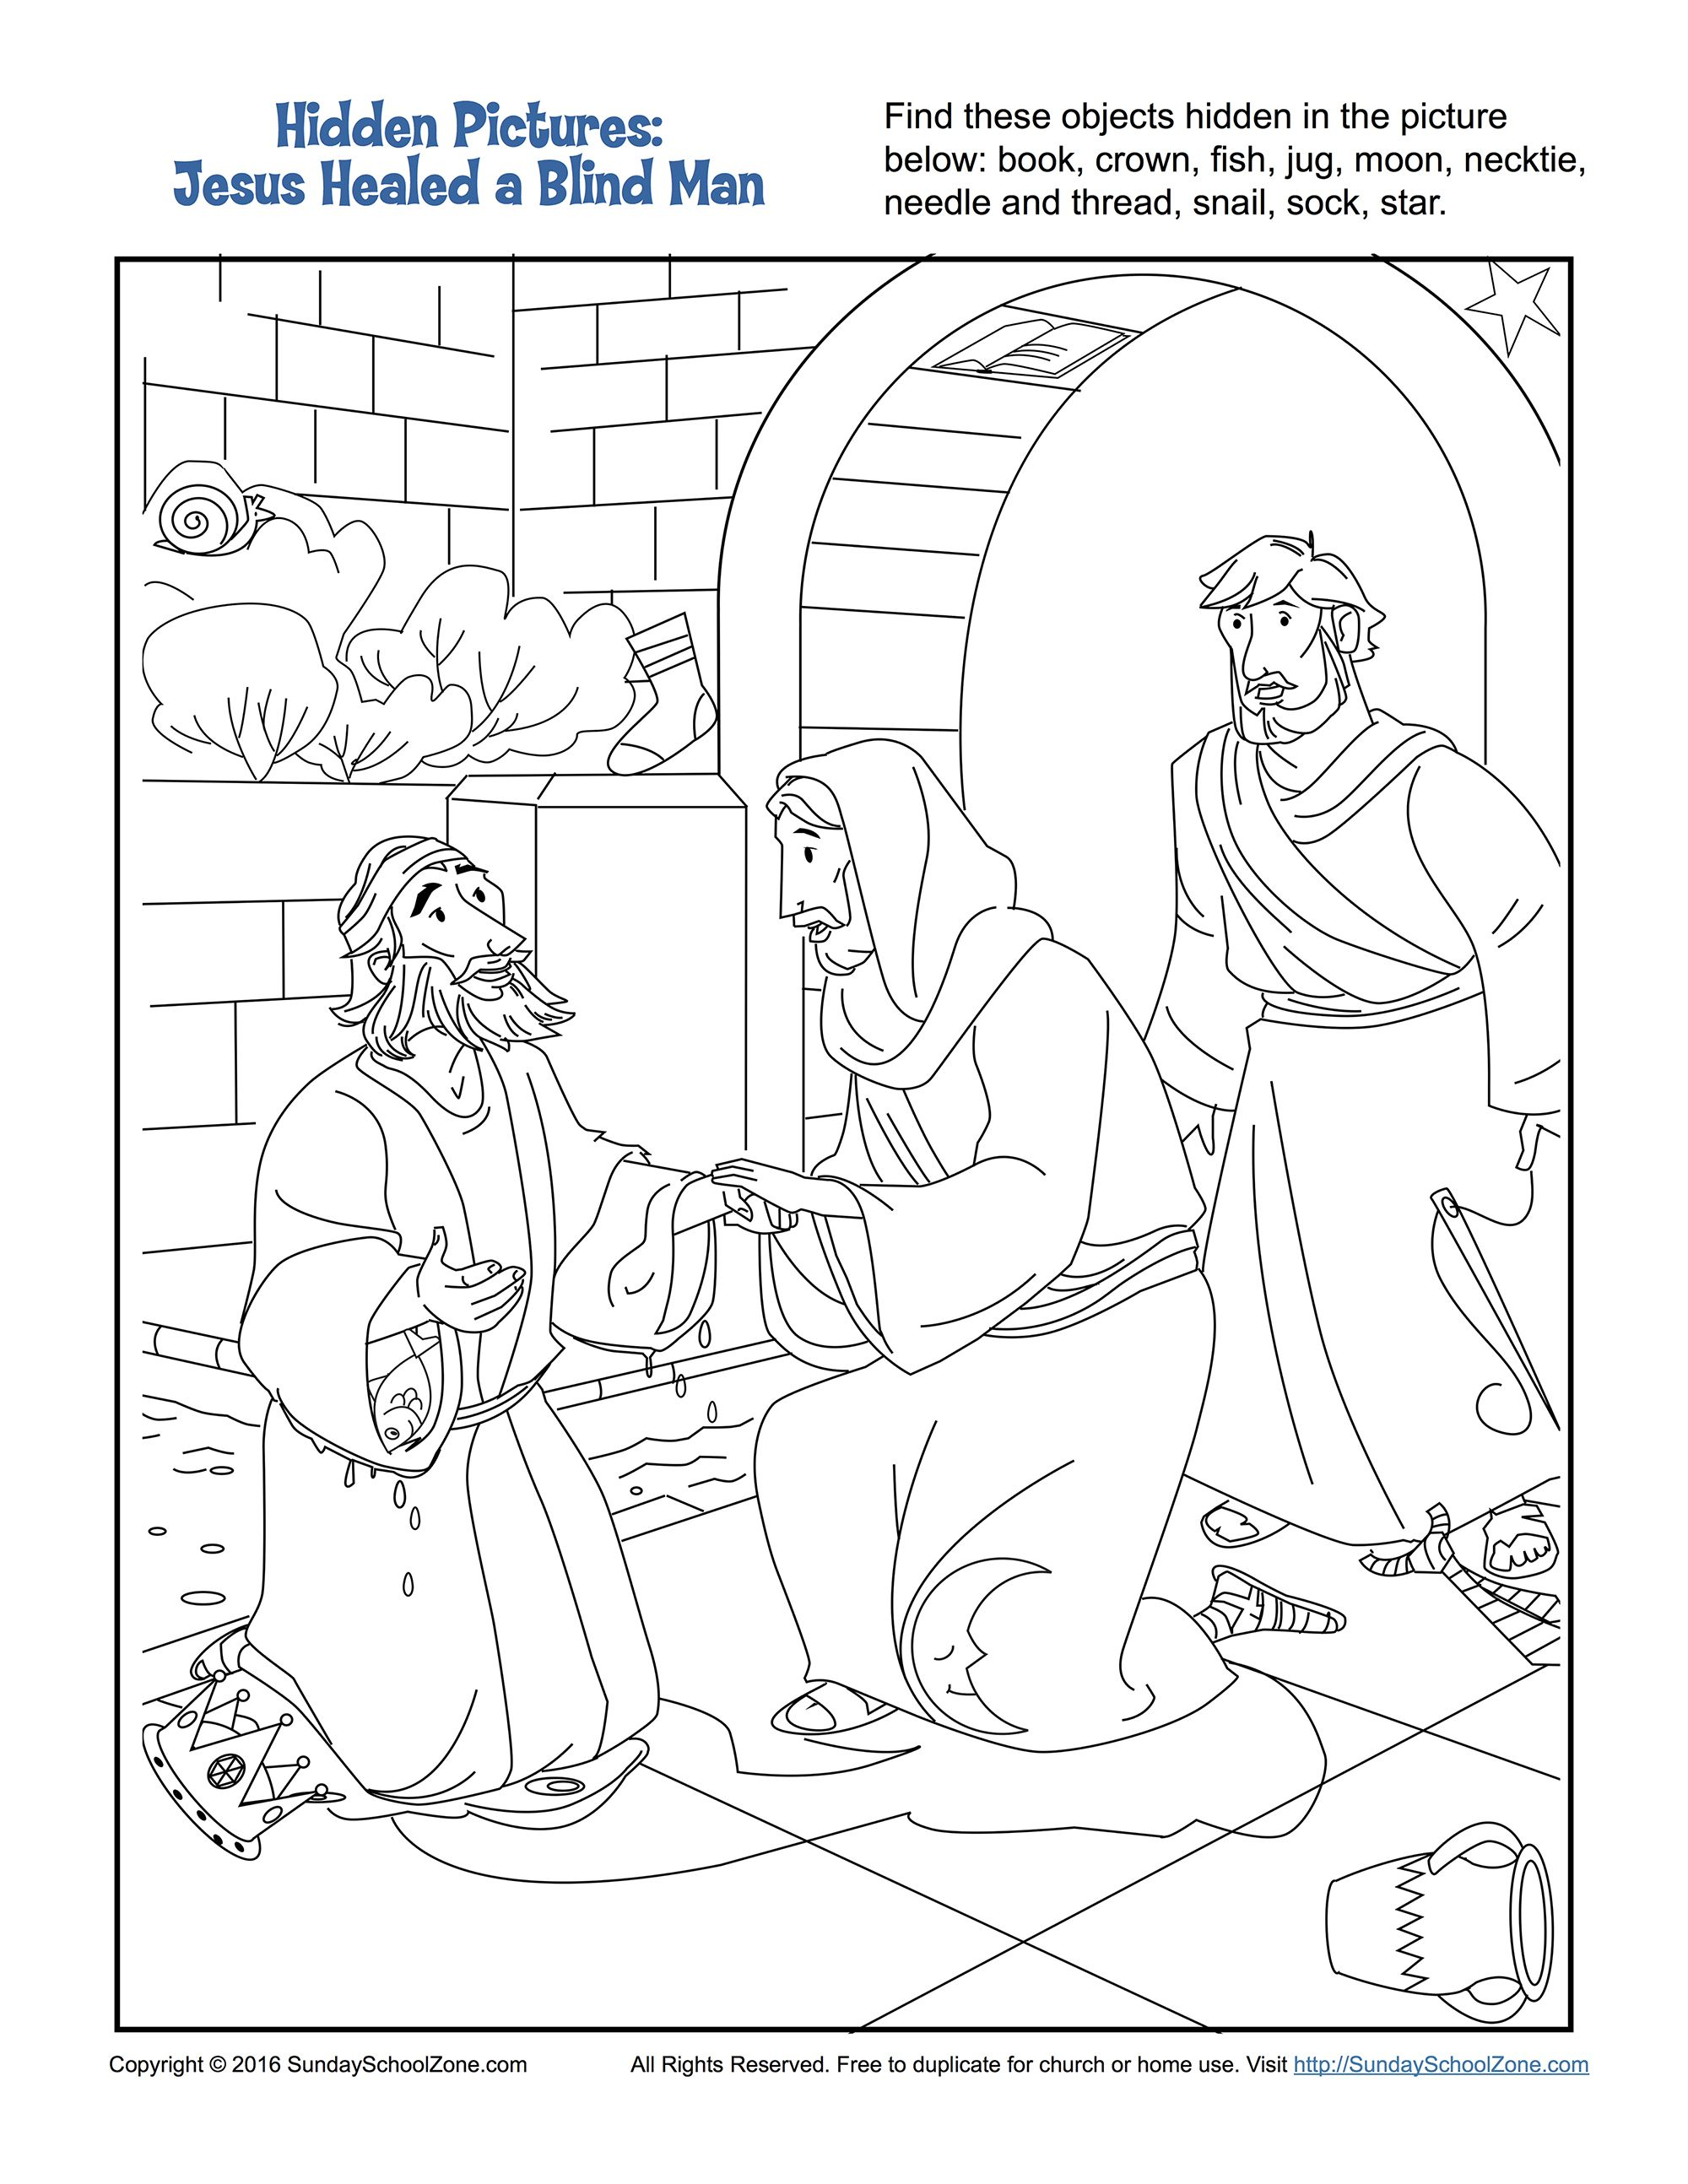 Jesus Healed A Man Born Blind Hidden Pictures Activity